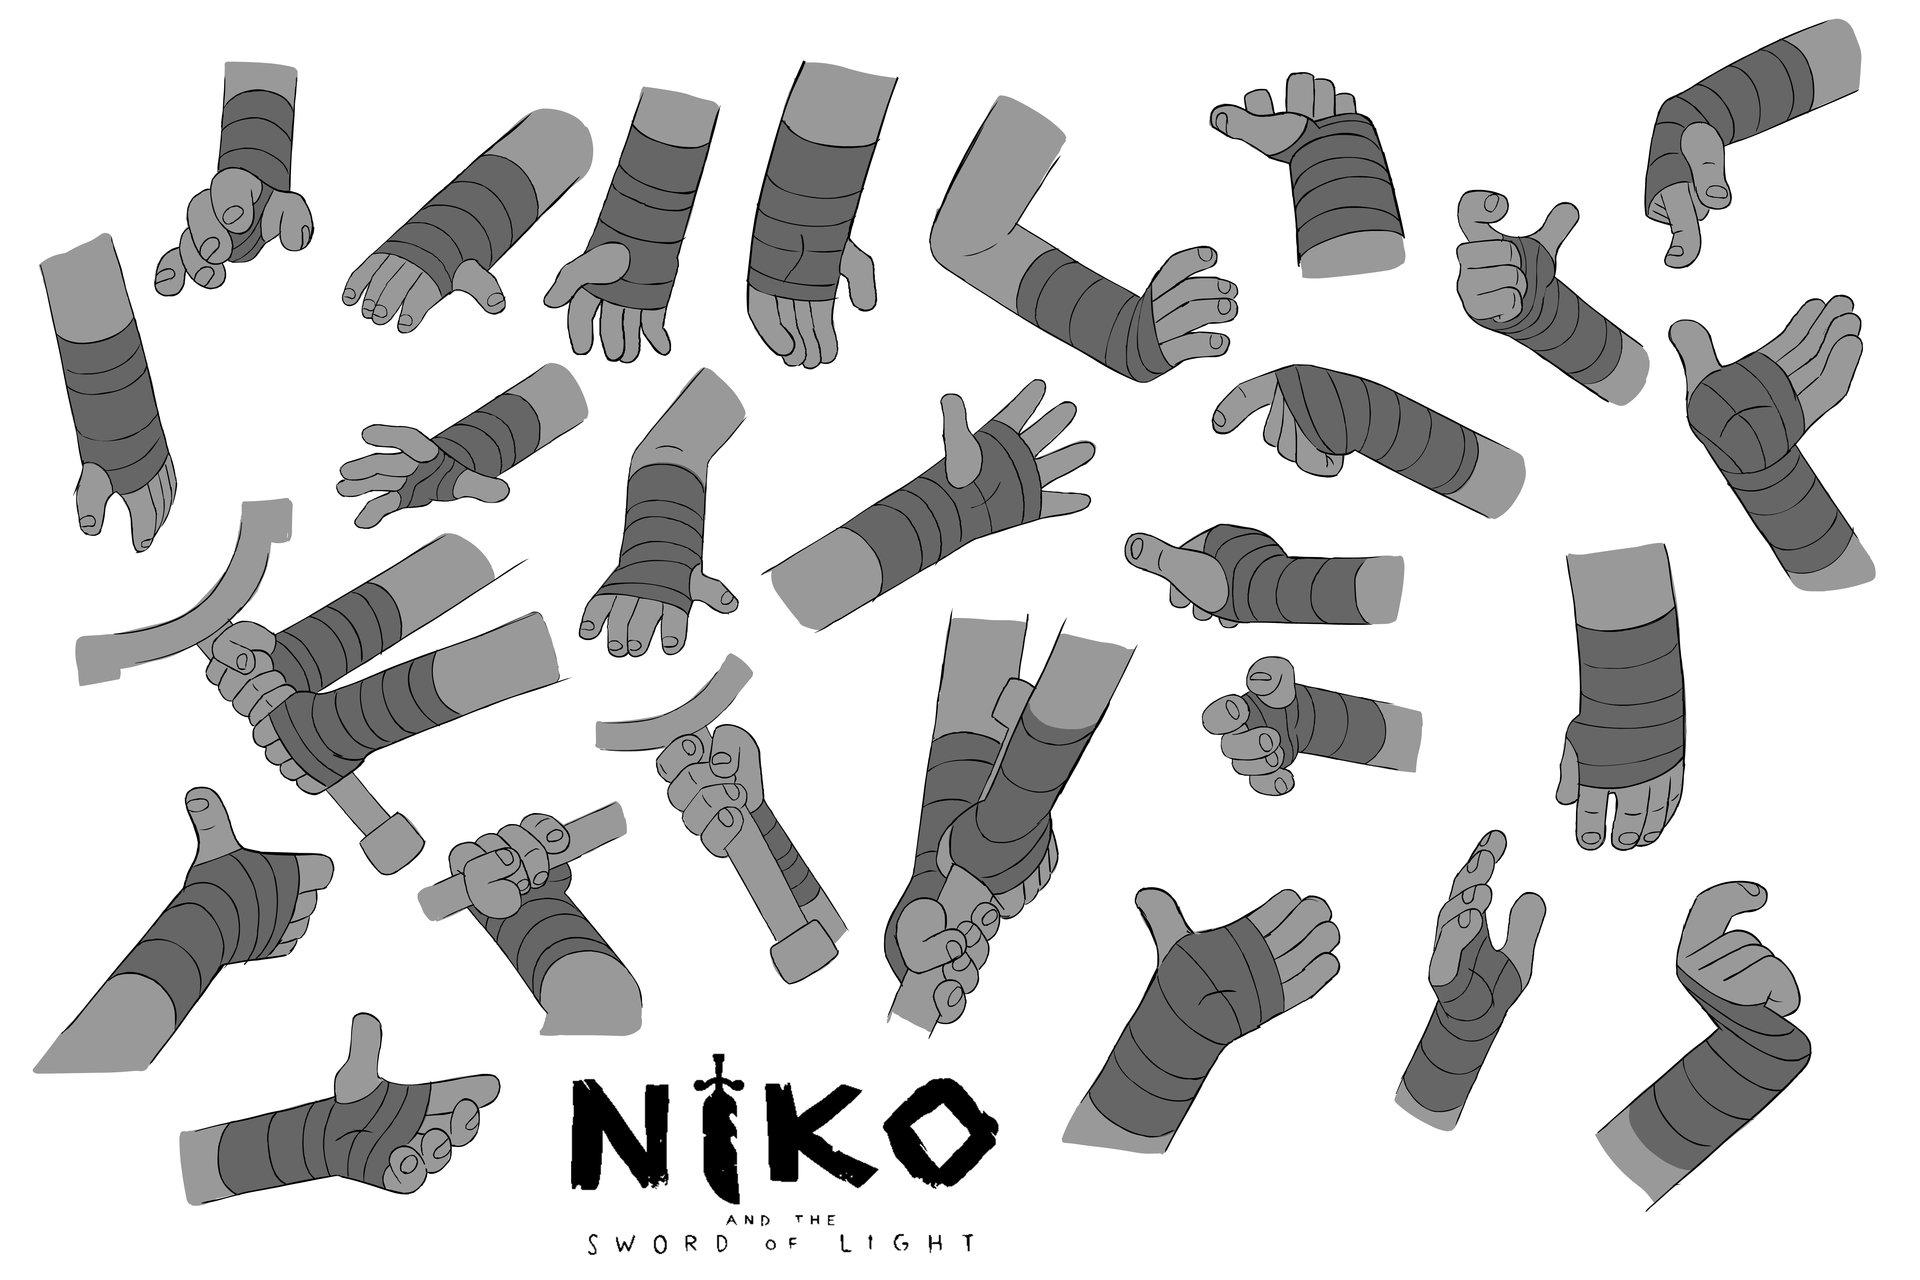 Jim bryson niko hands01